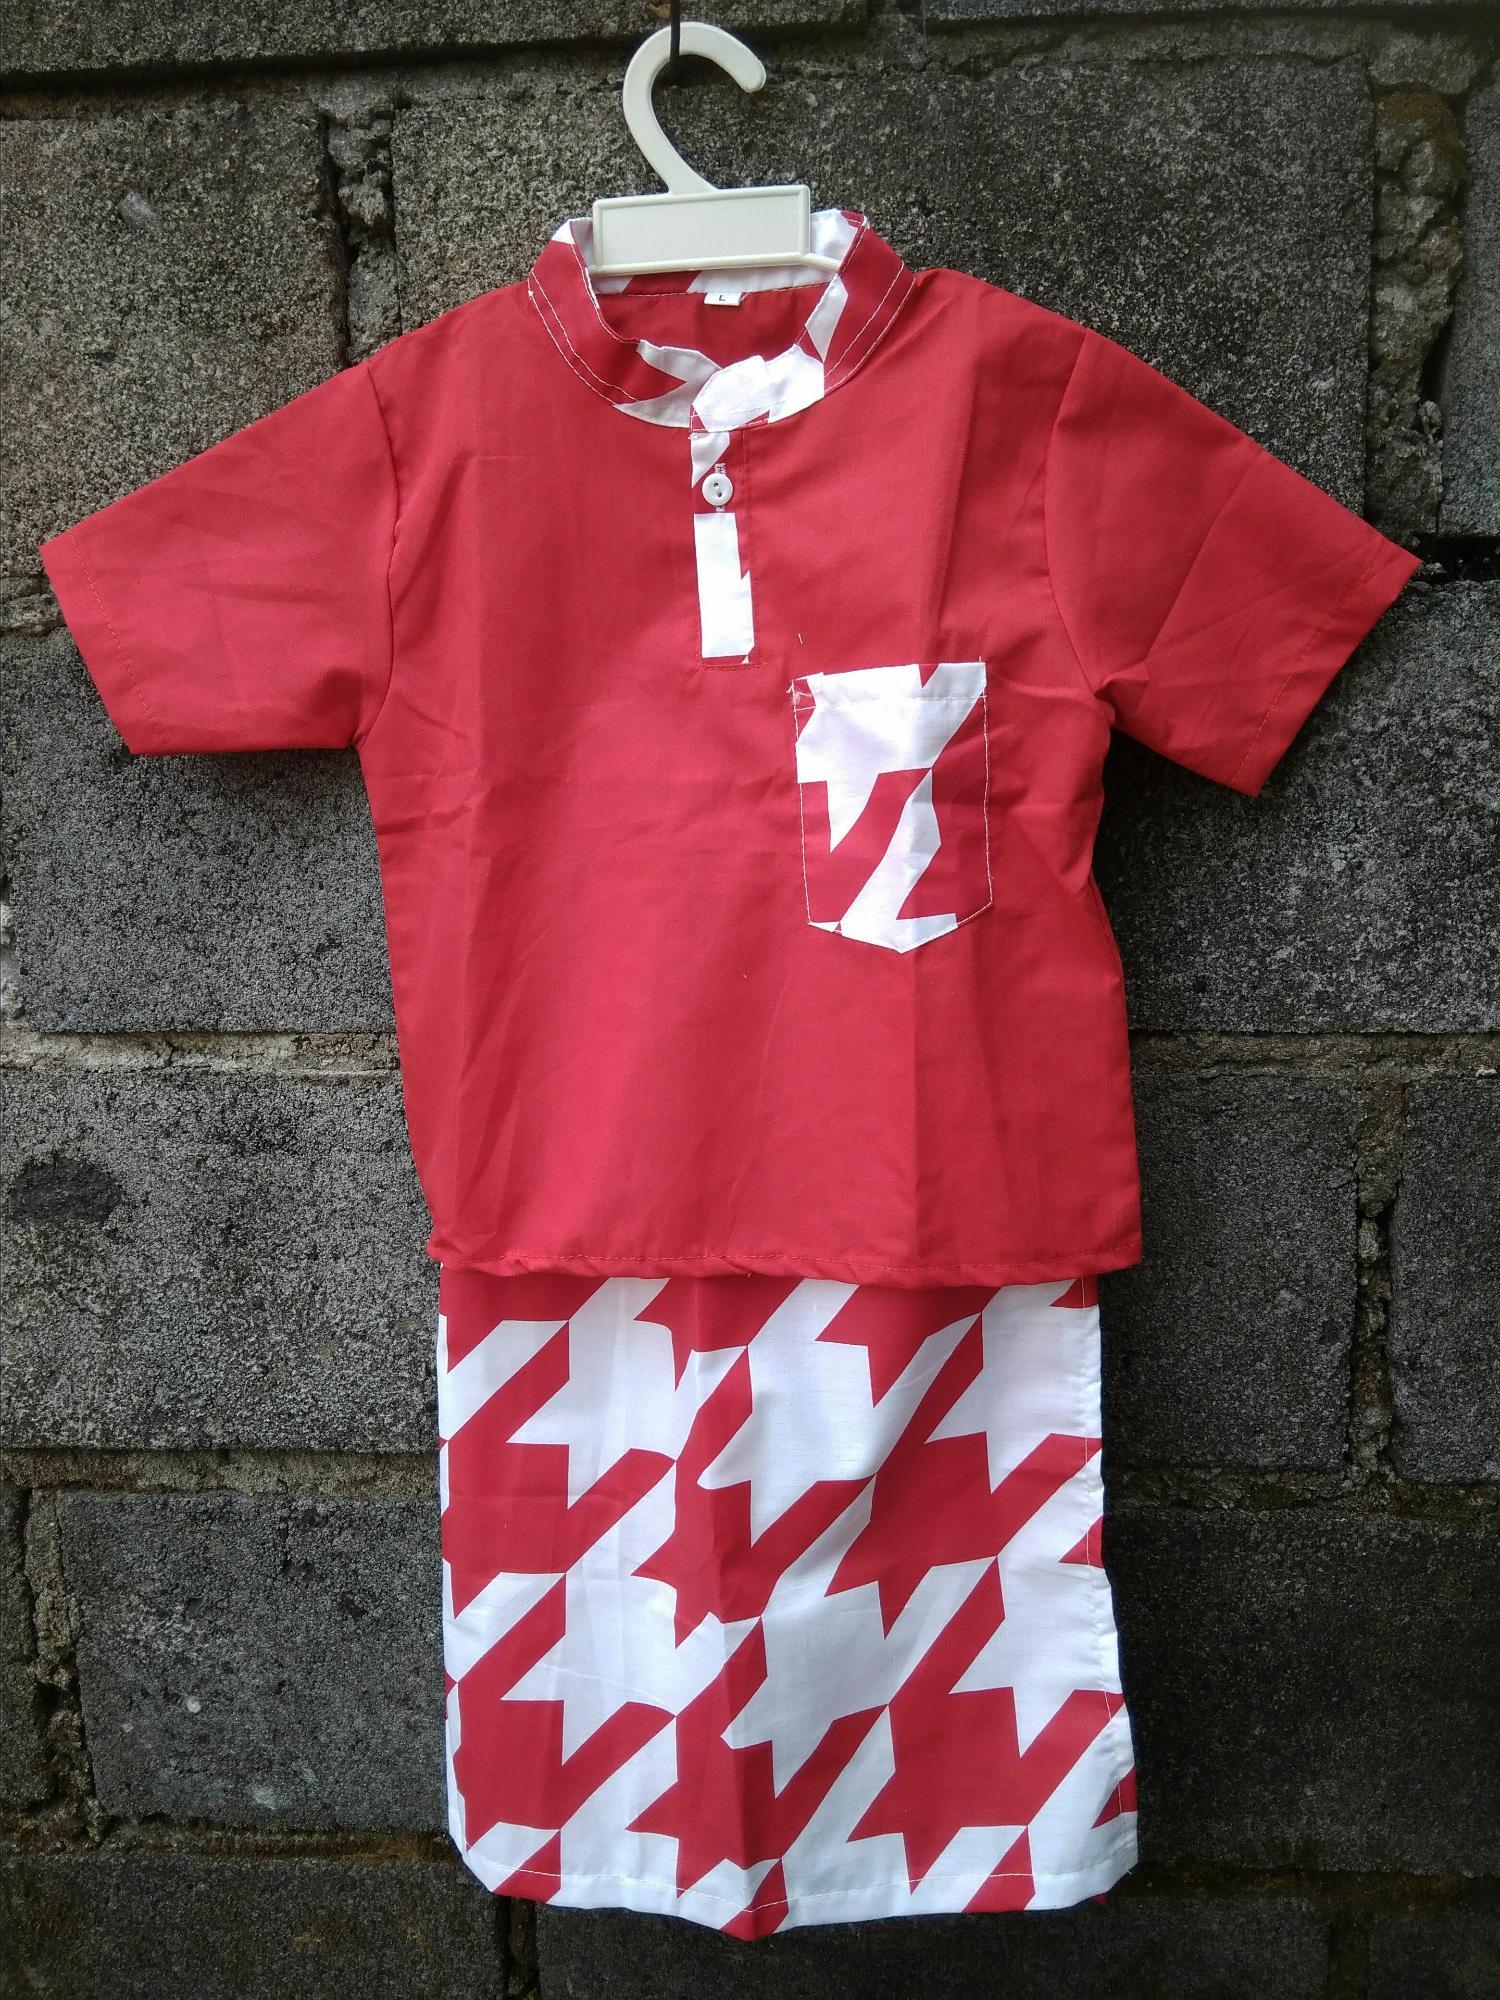 Cek Harga Baru Kokici Koko Anak Sarung Celana Peci Model Koki Baby Sarkoci Usia 1 Tahun 12 Warna Acak